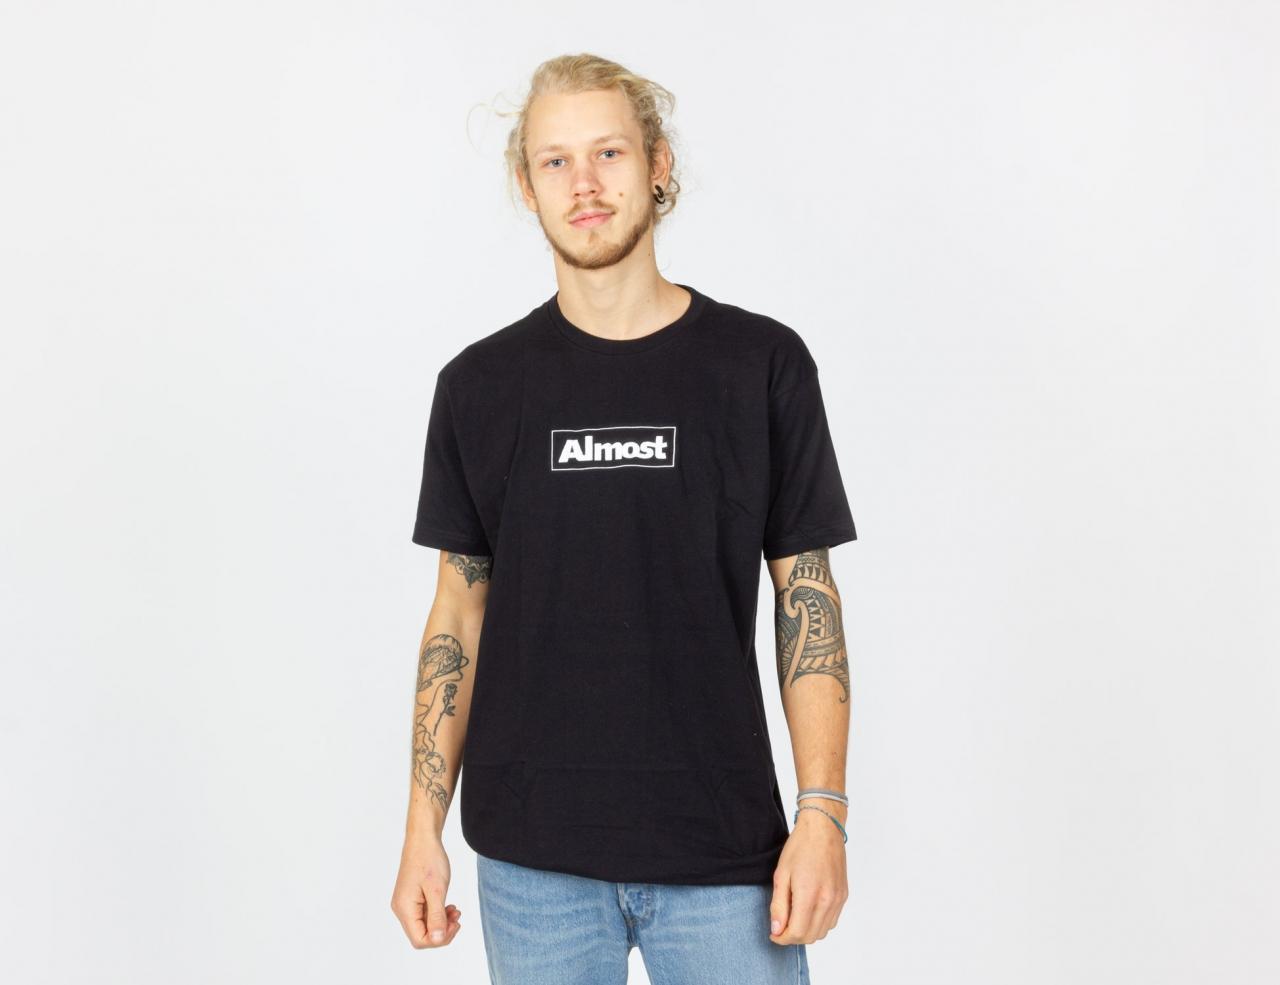 Almost Remium EMB Box Shirt - Black